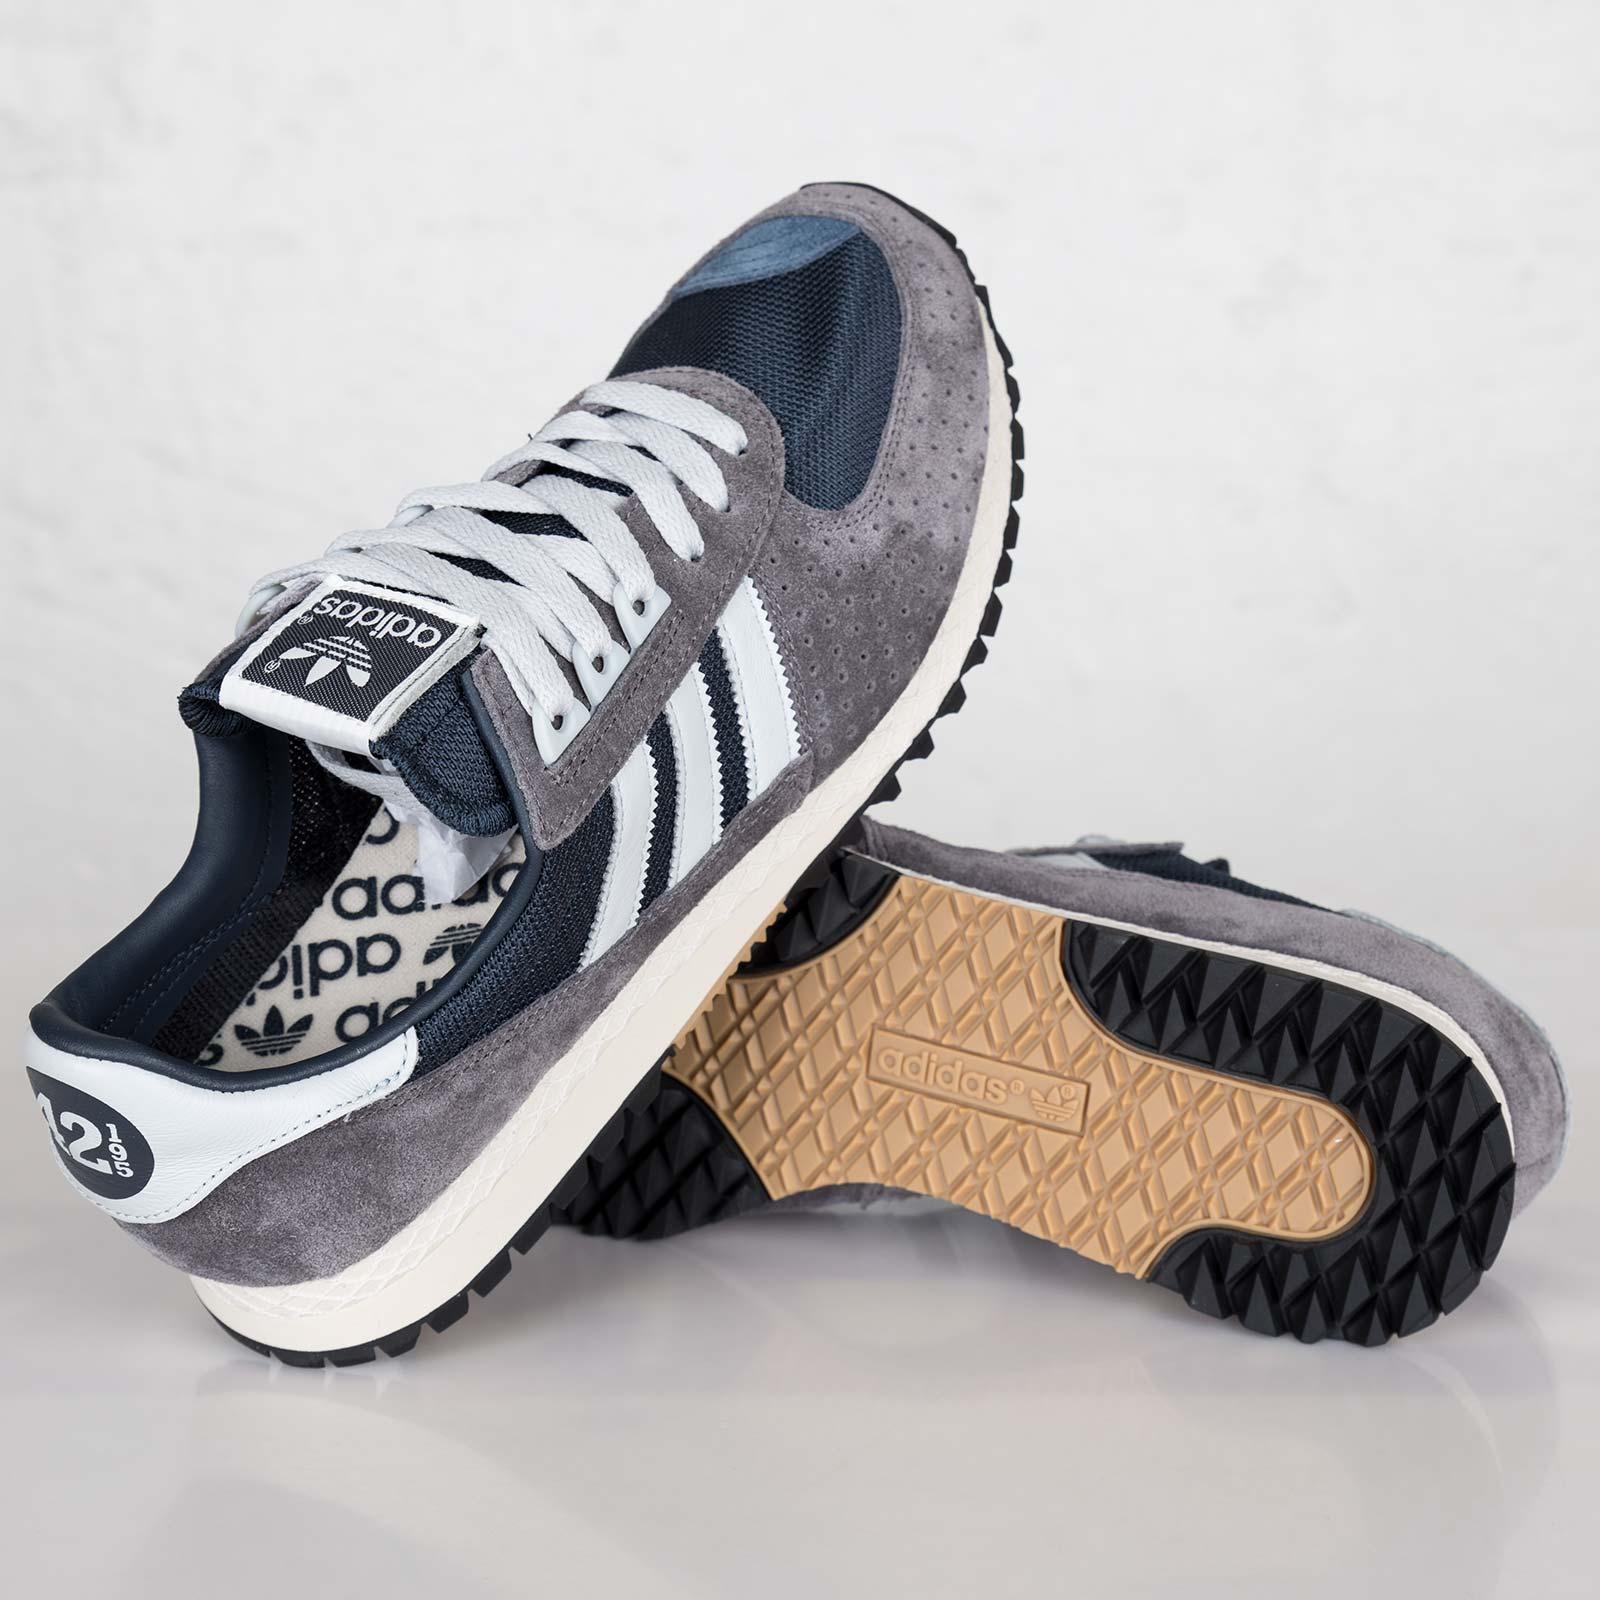 adidas City Marathon PT 42 195 - D67349 - Sneakersnstuff  edd9baf812a